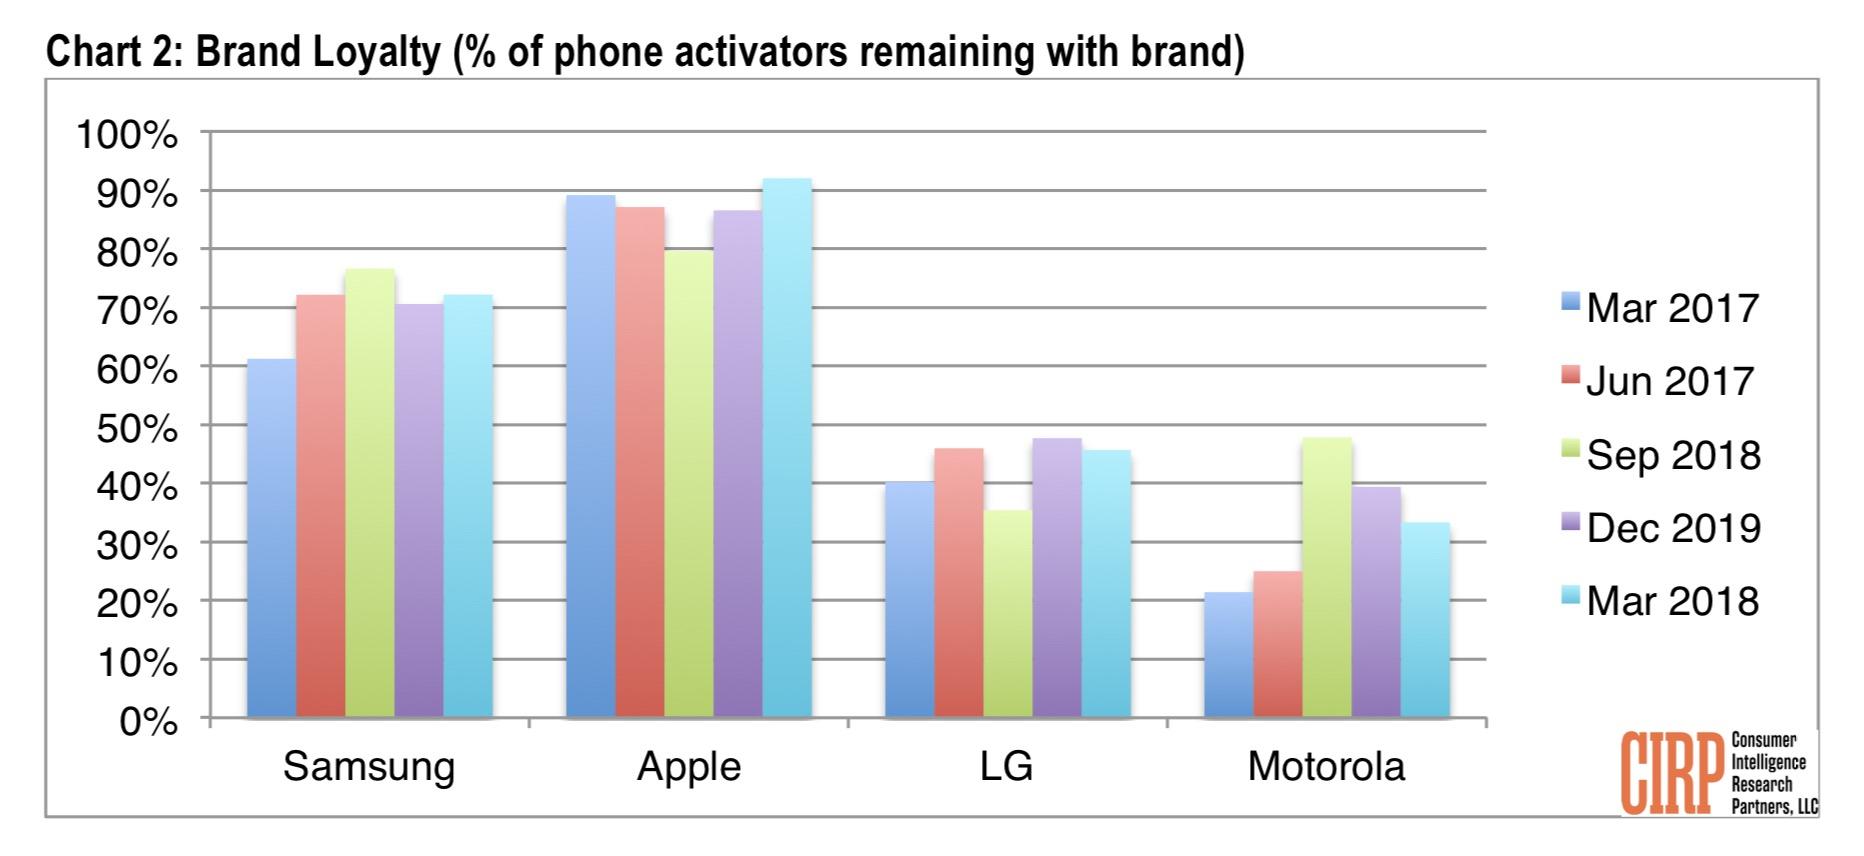 Apple vanzari Telefoane Samsung loialitate